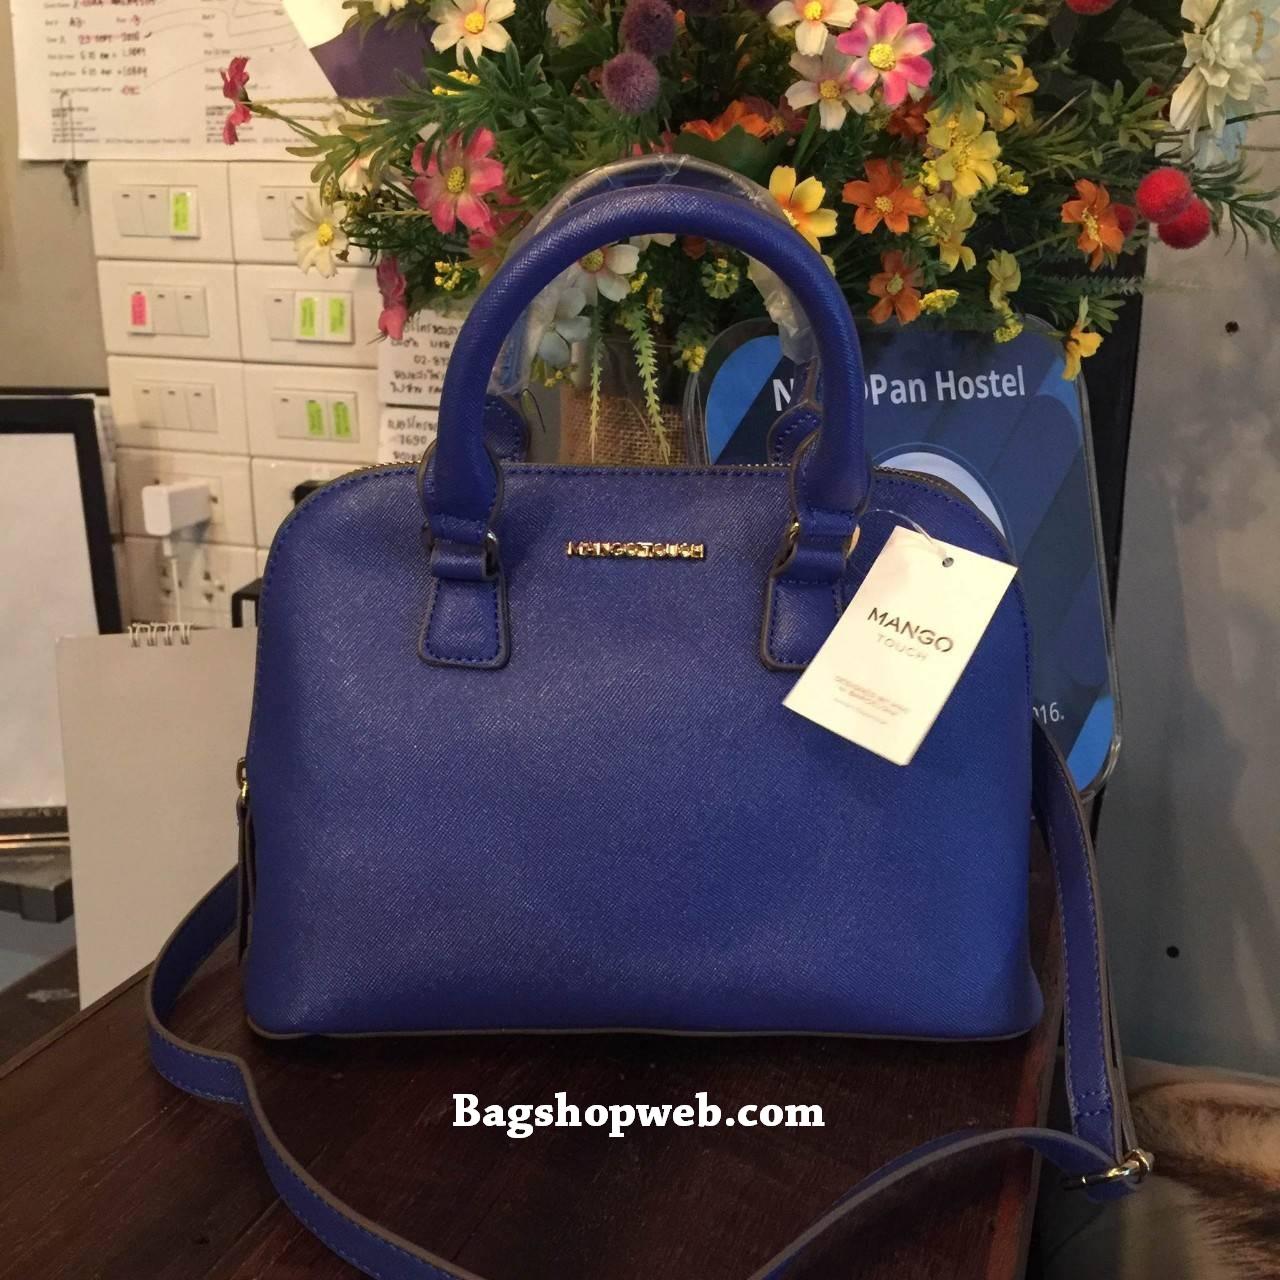 MANGO Alma Bag